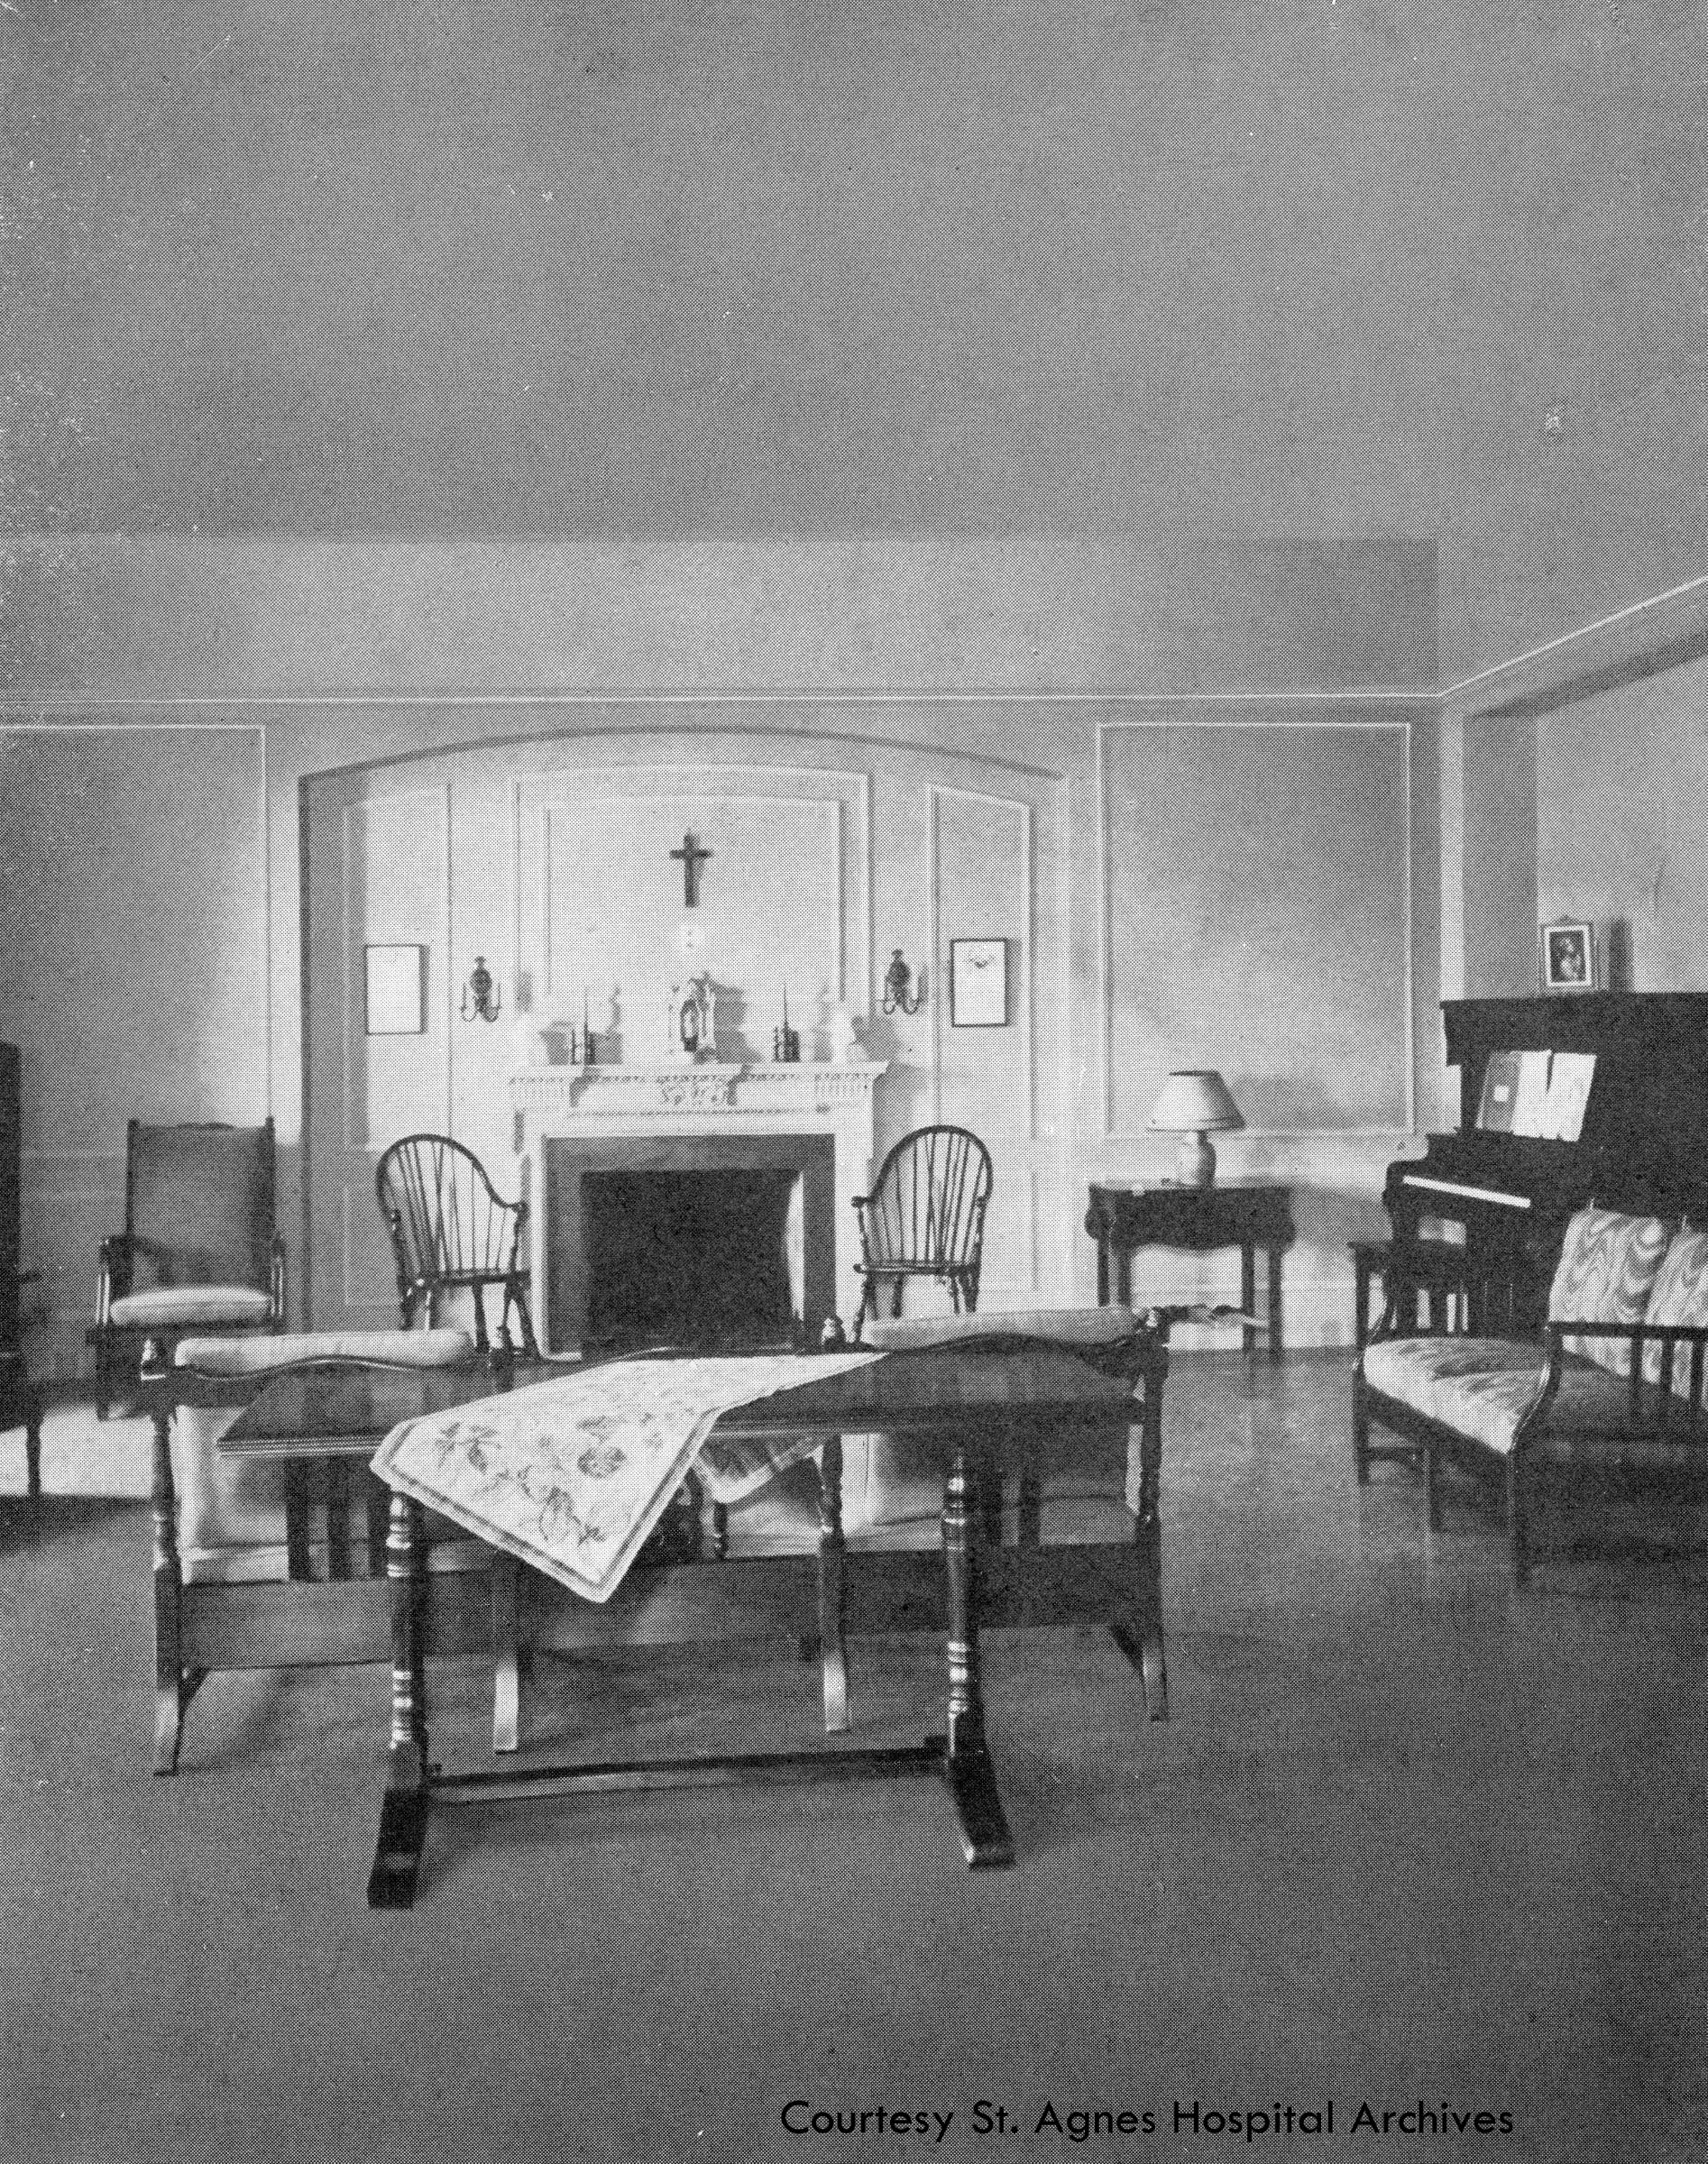 Student lounge at St. Agnes School of Nursing, c. 1931.